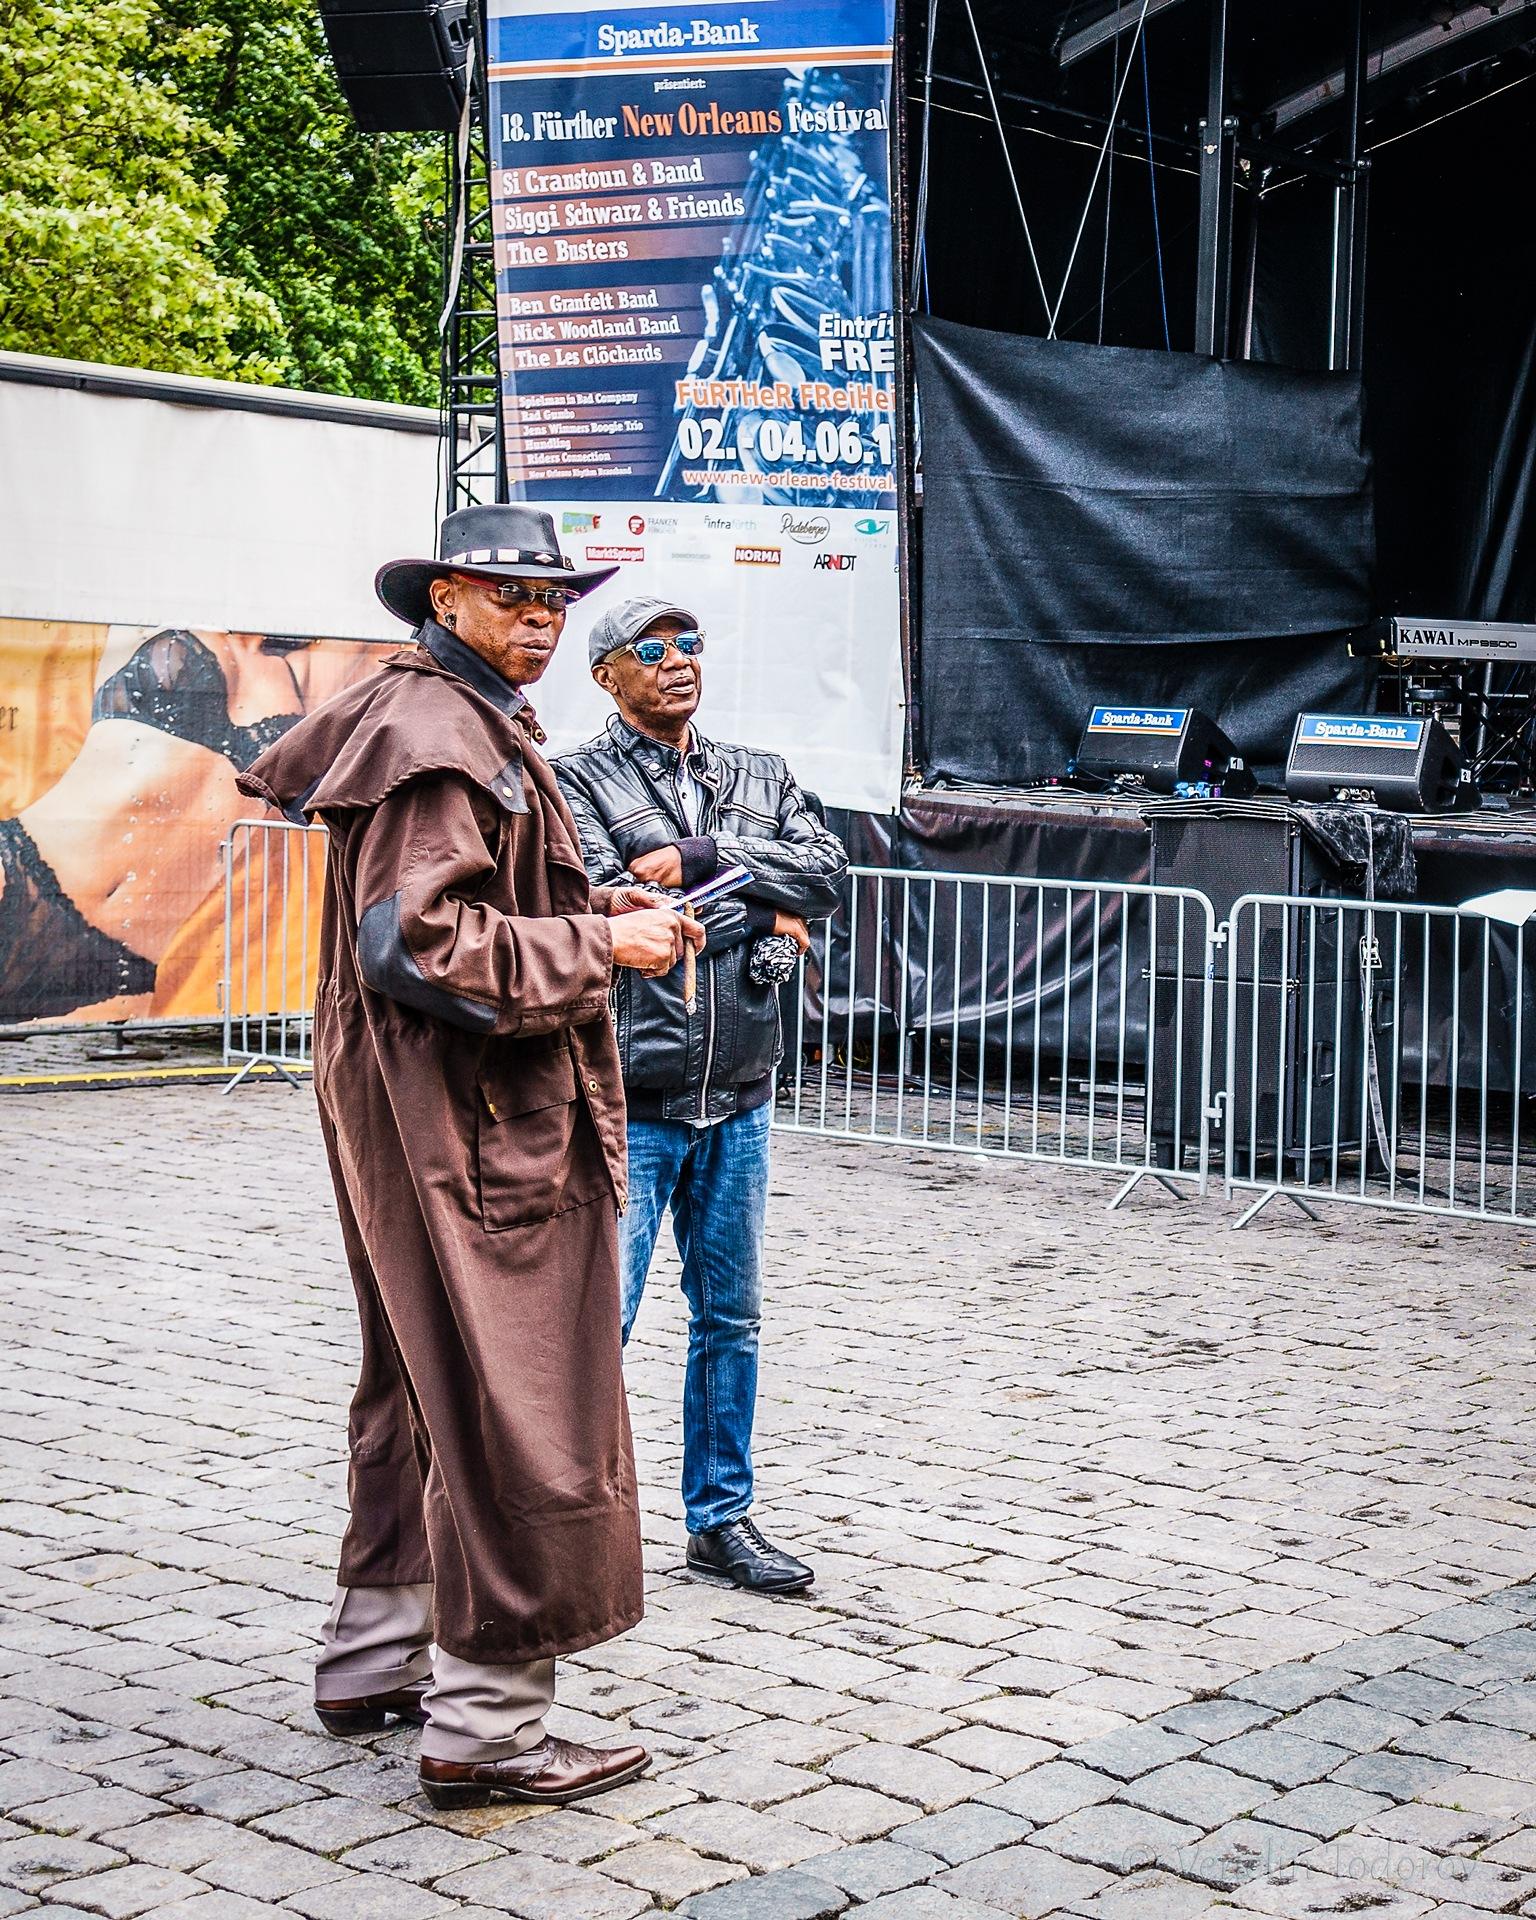 New Orleans Festival by Venelin Todorov